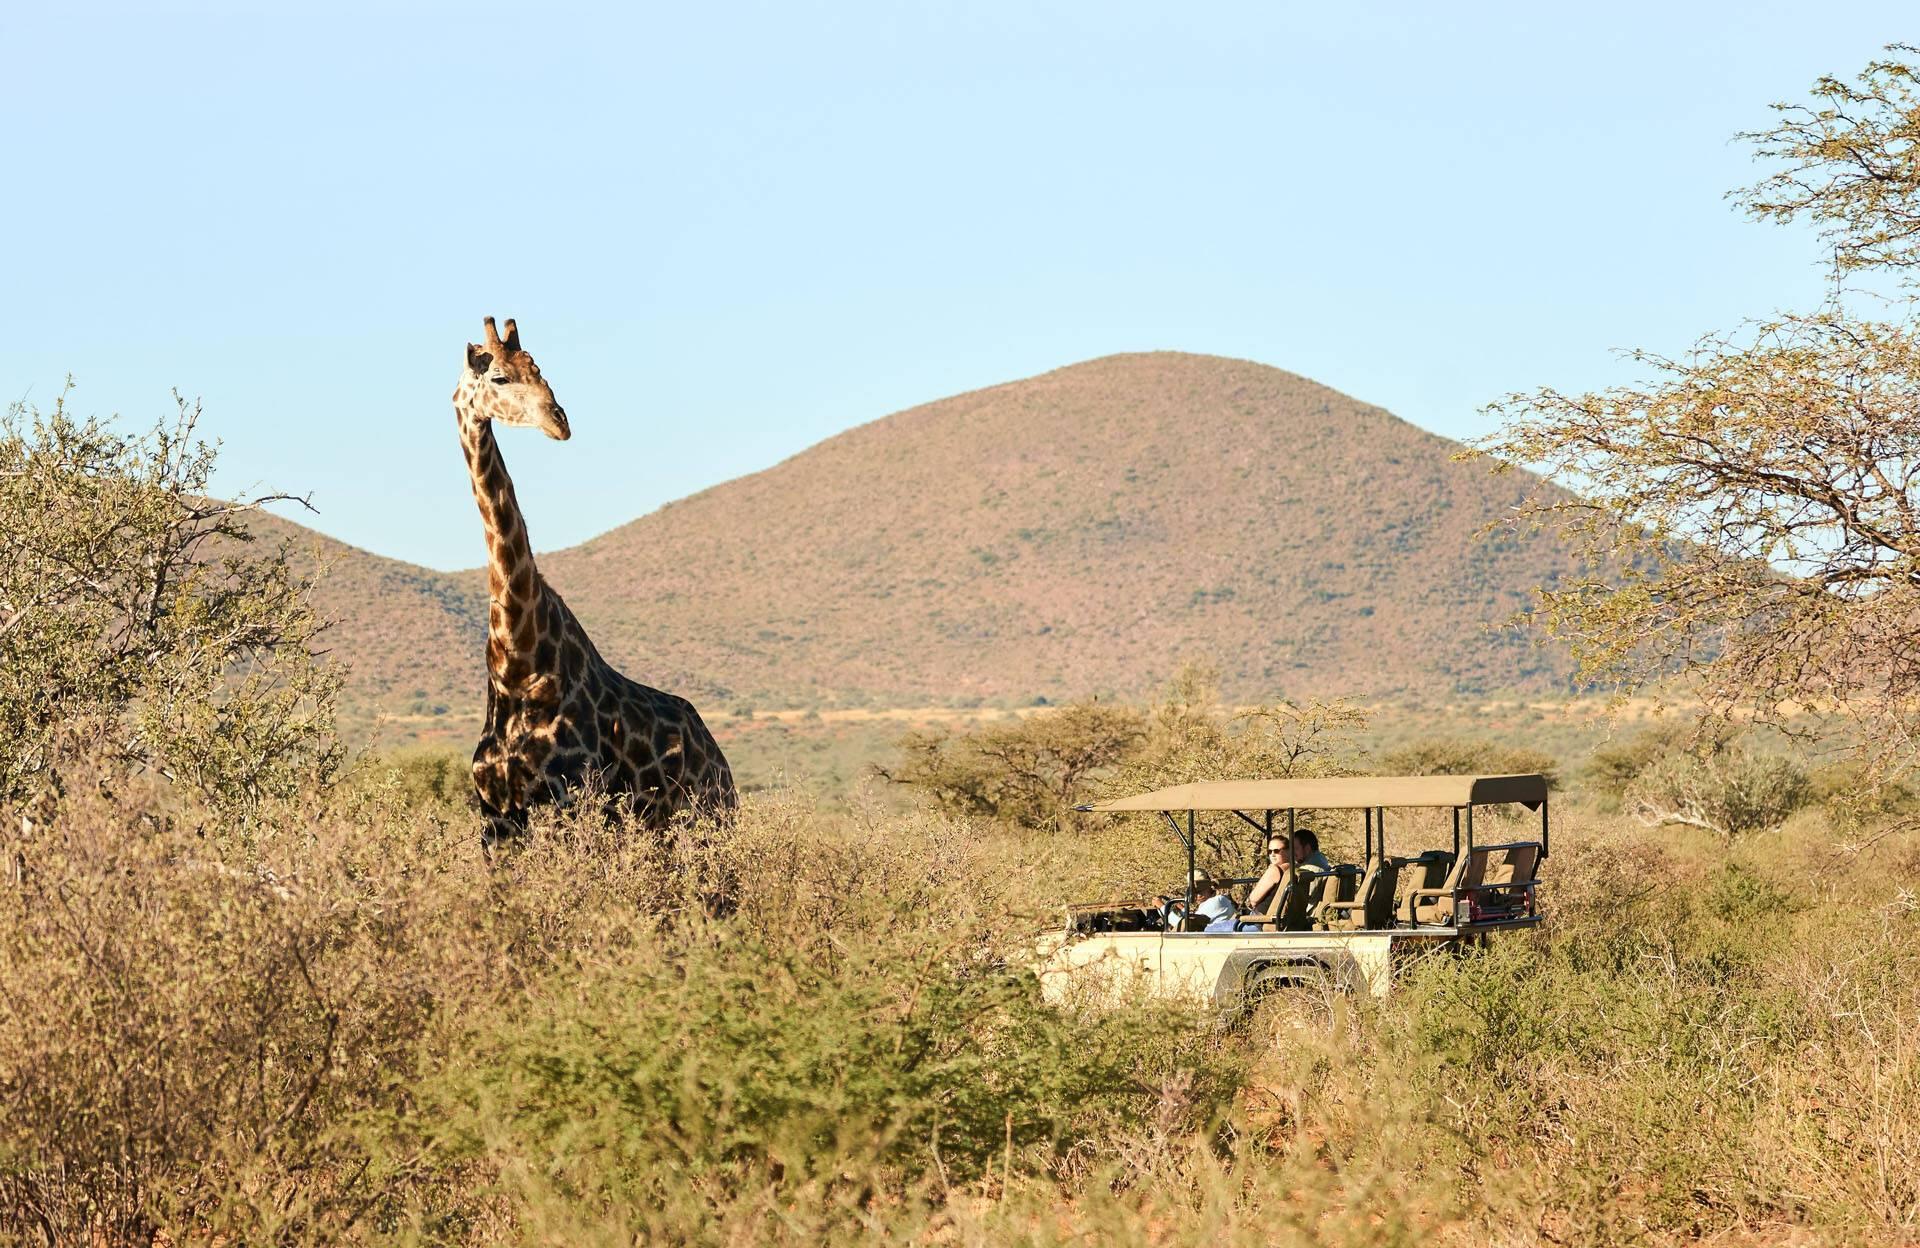 Tswalu Reserve Motse Afrique Sud Safari